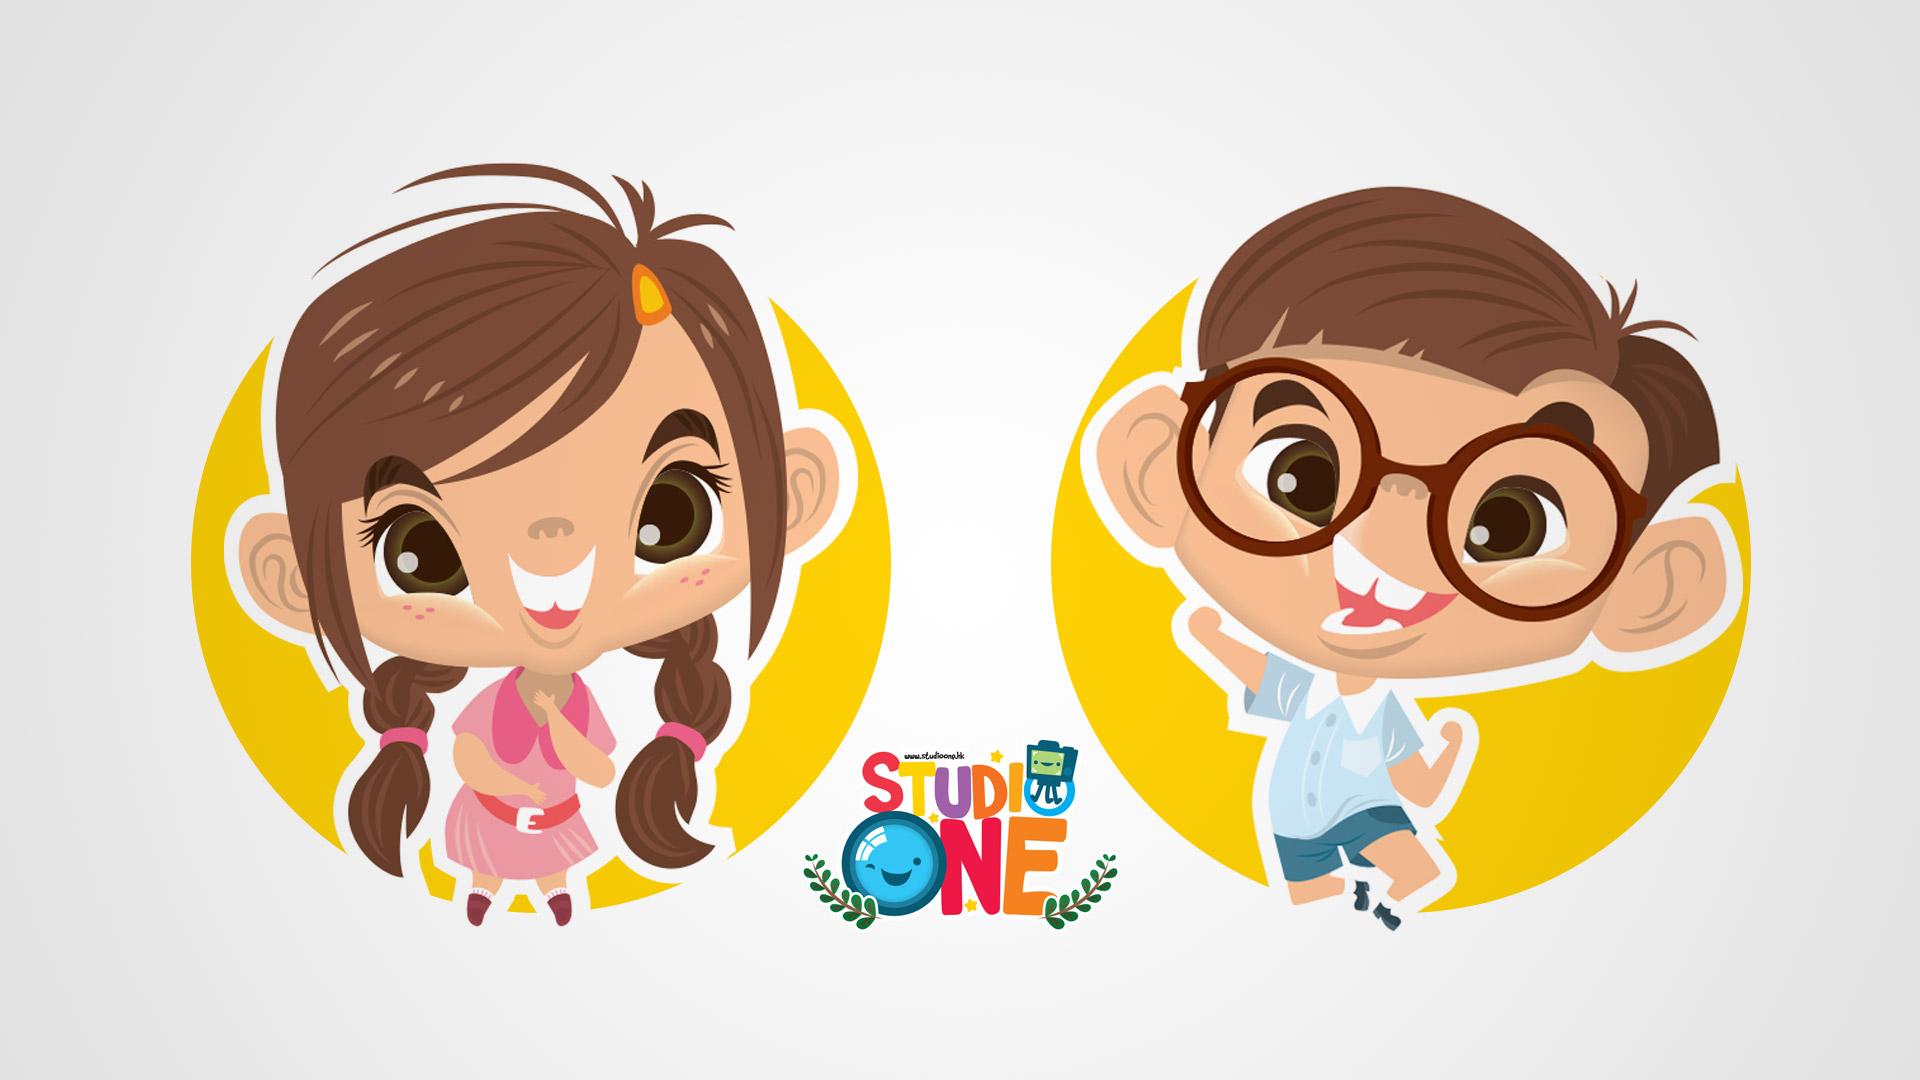 Studio One Characters Design